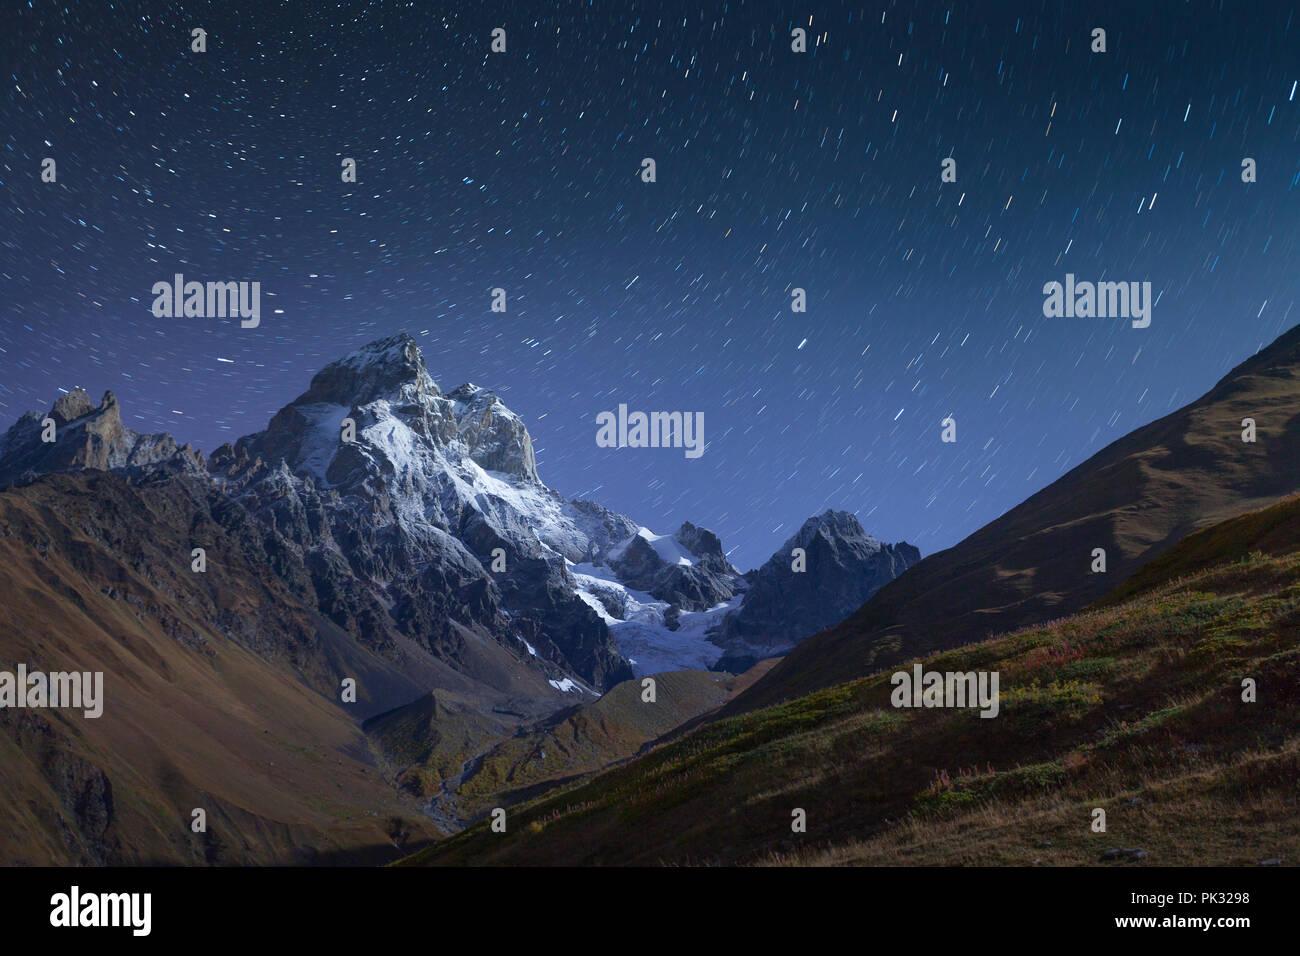 Night view of Mt. Ushba in Caucasus mountains. Upper Svaneti, Main Caucasus ridge, Georgia, Europe. October 2015. - Stock Image